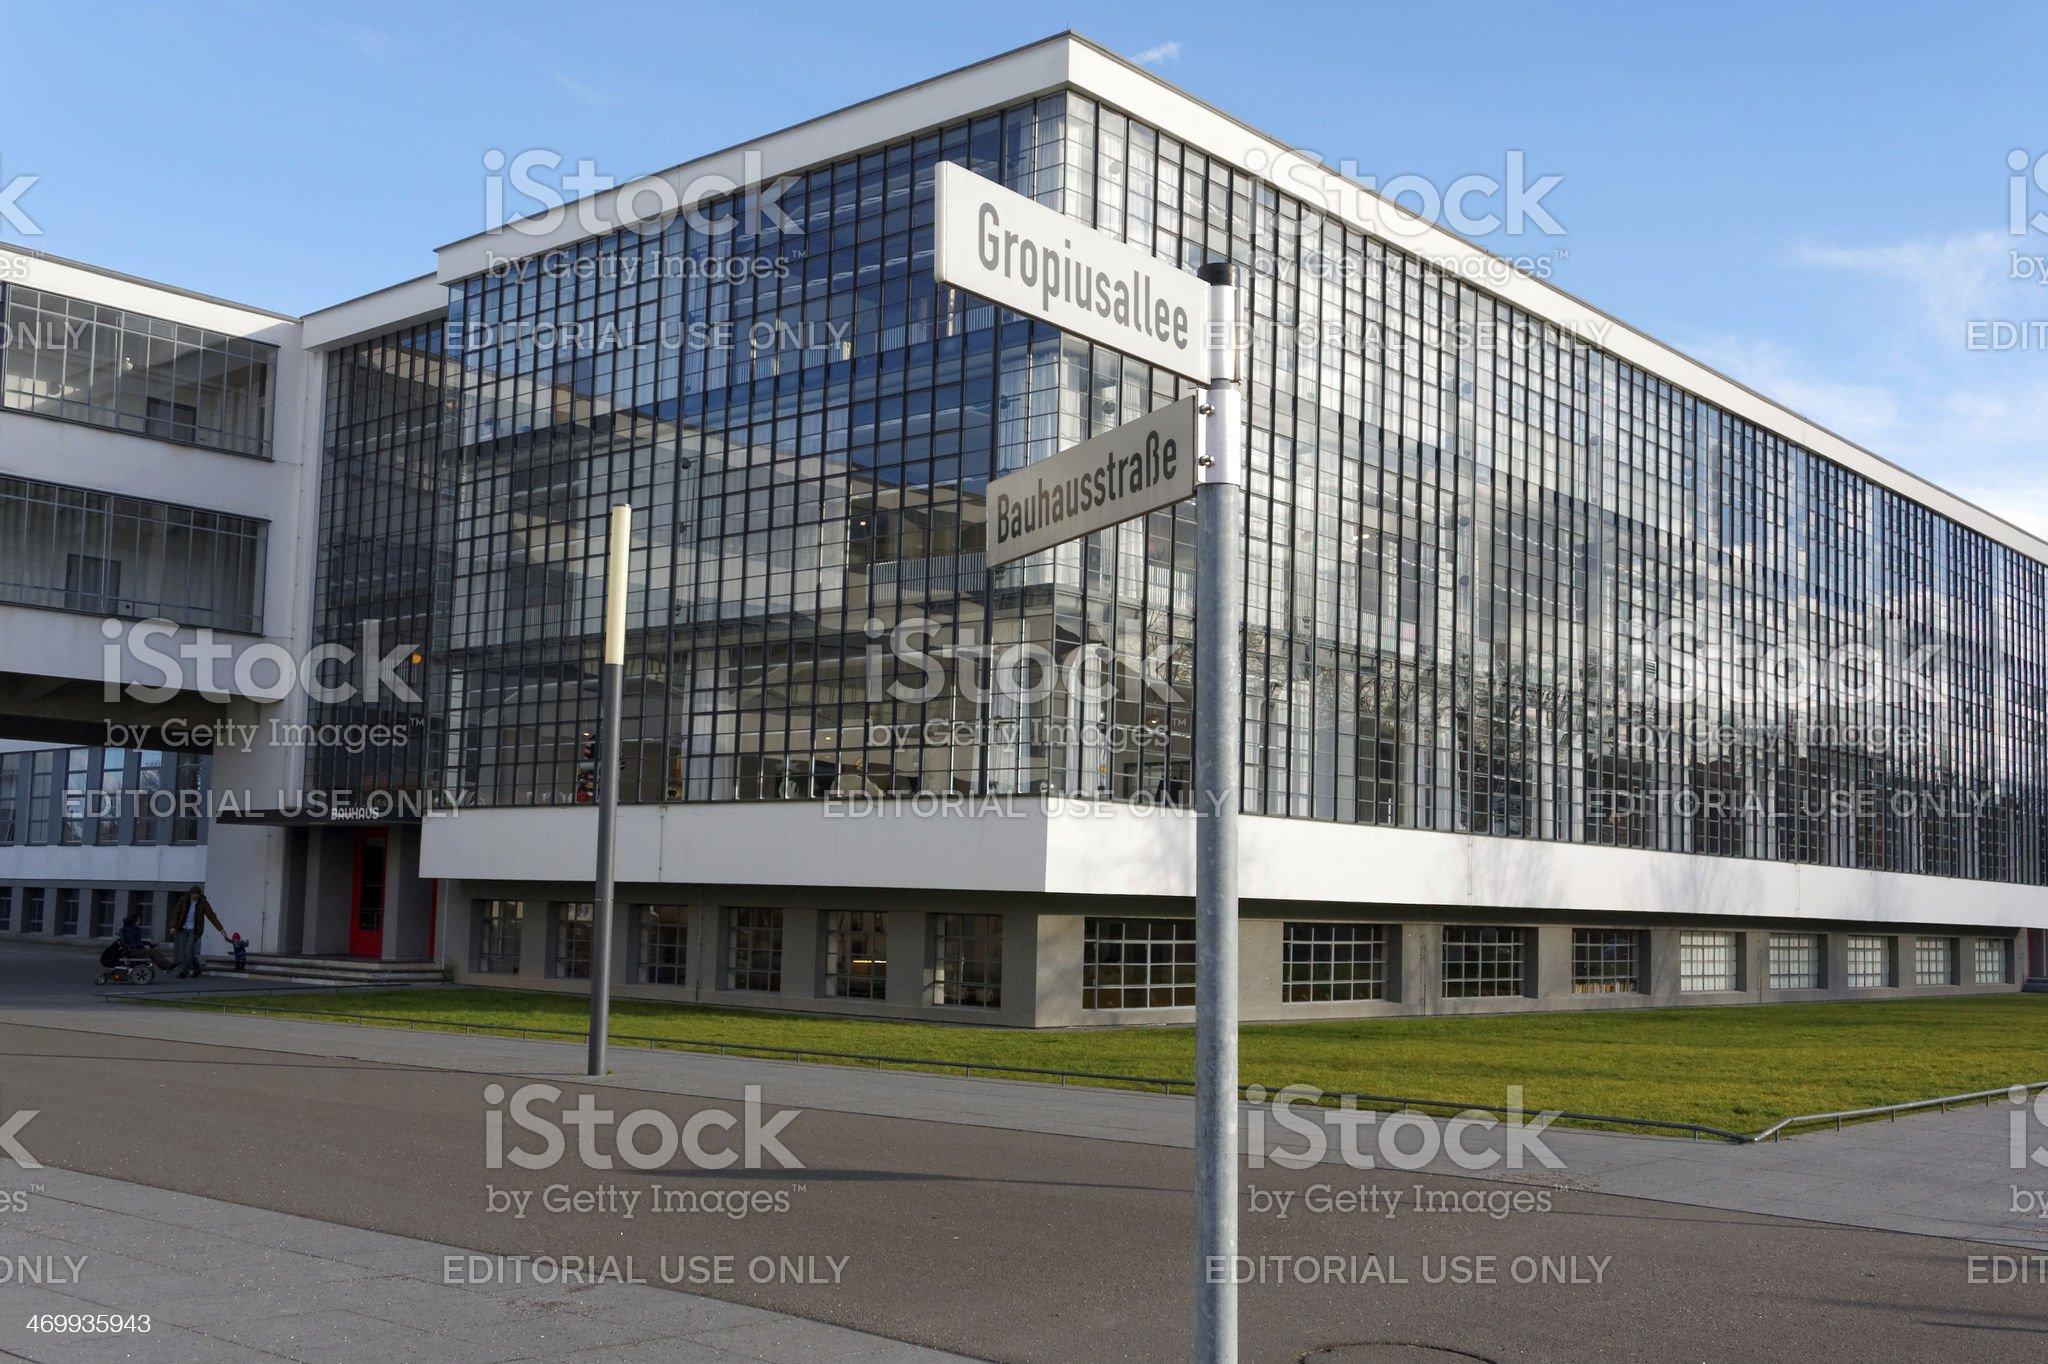 Bauhaus Dessau with street name sign royalty-free stock photo